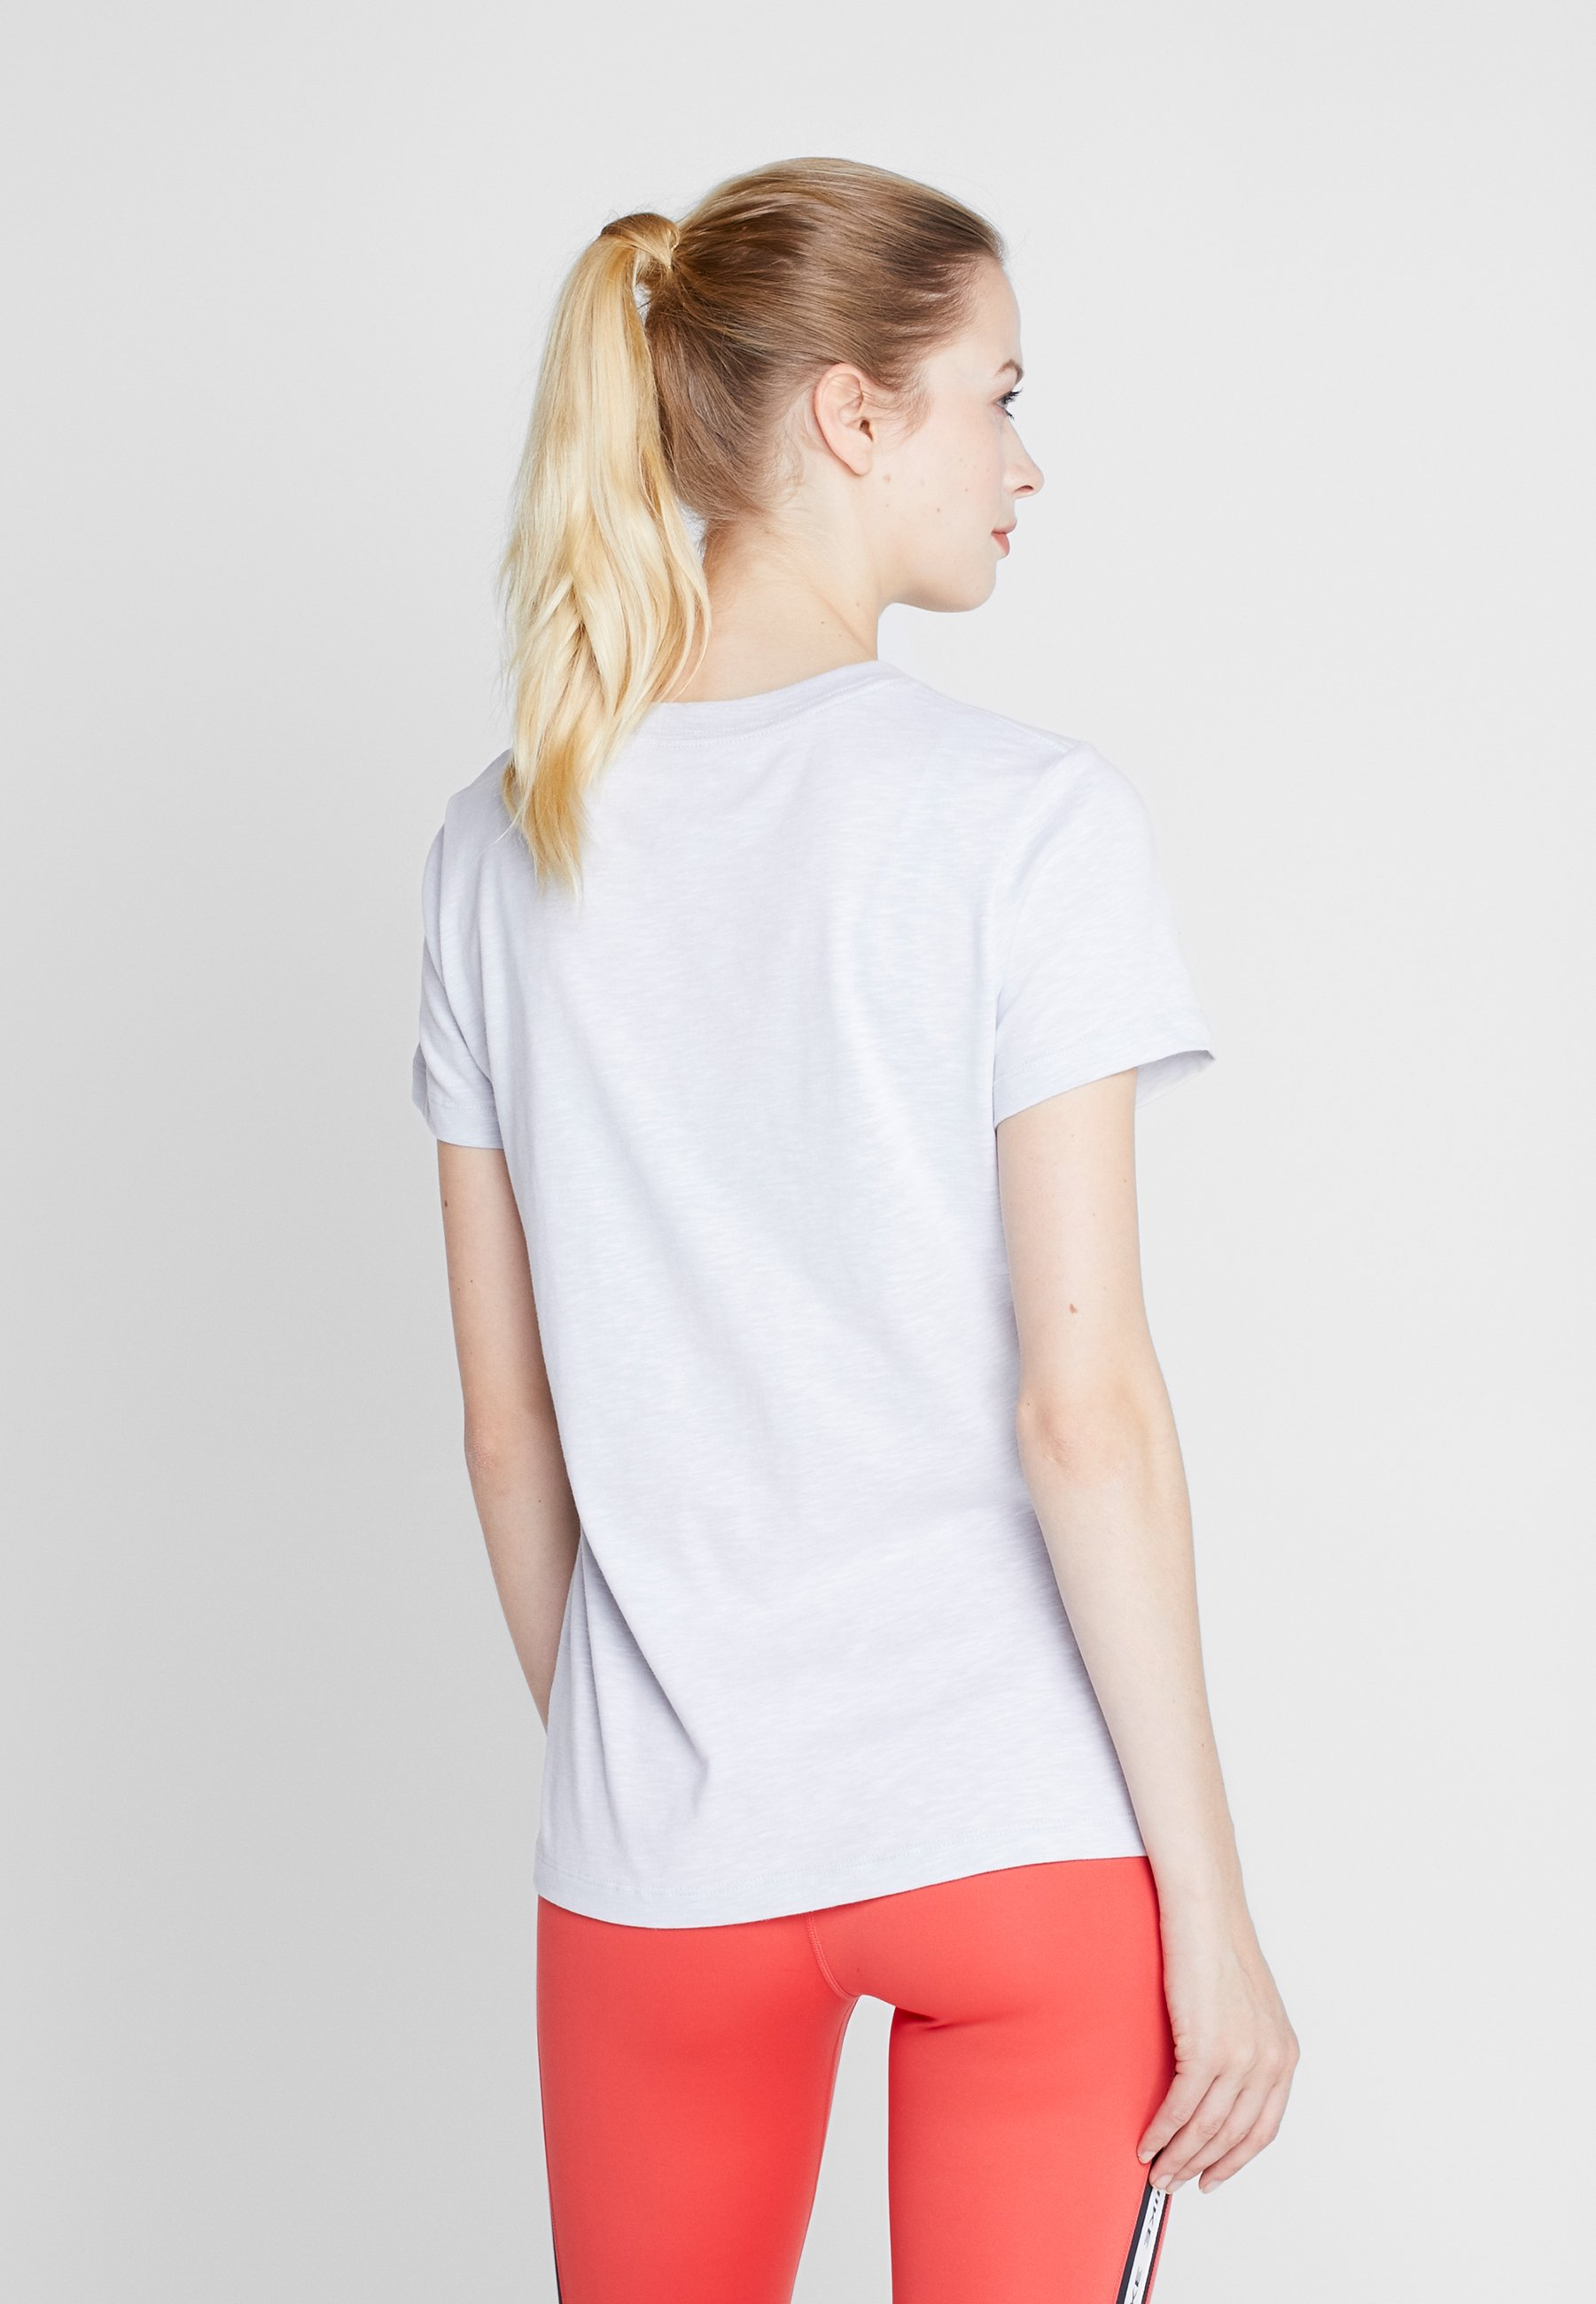 Koop Nieuwste Best Verkopende Dameskleding sdkjGX55lghisd Nike Performance DRY TEE CREW T-shirt print white/black A5DWFVF